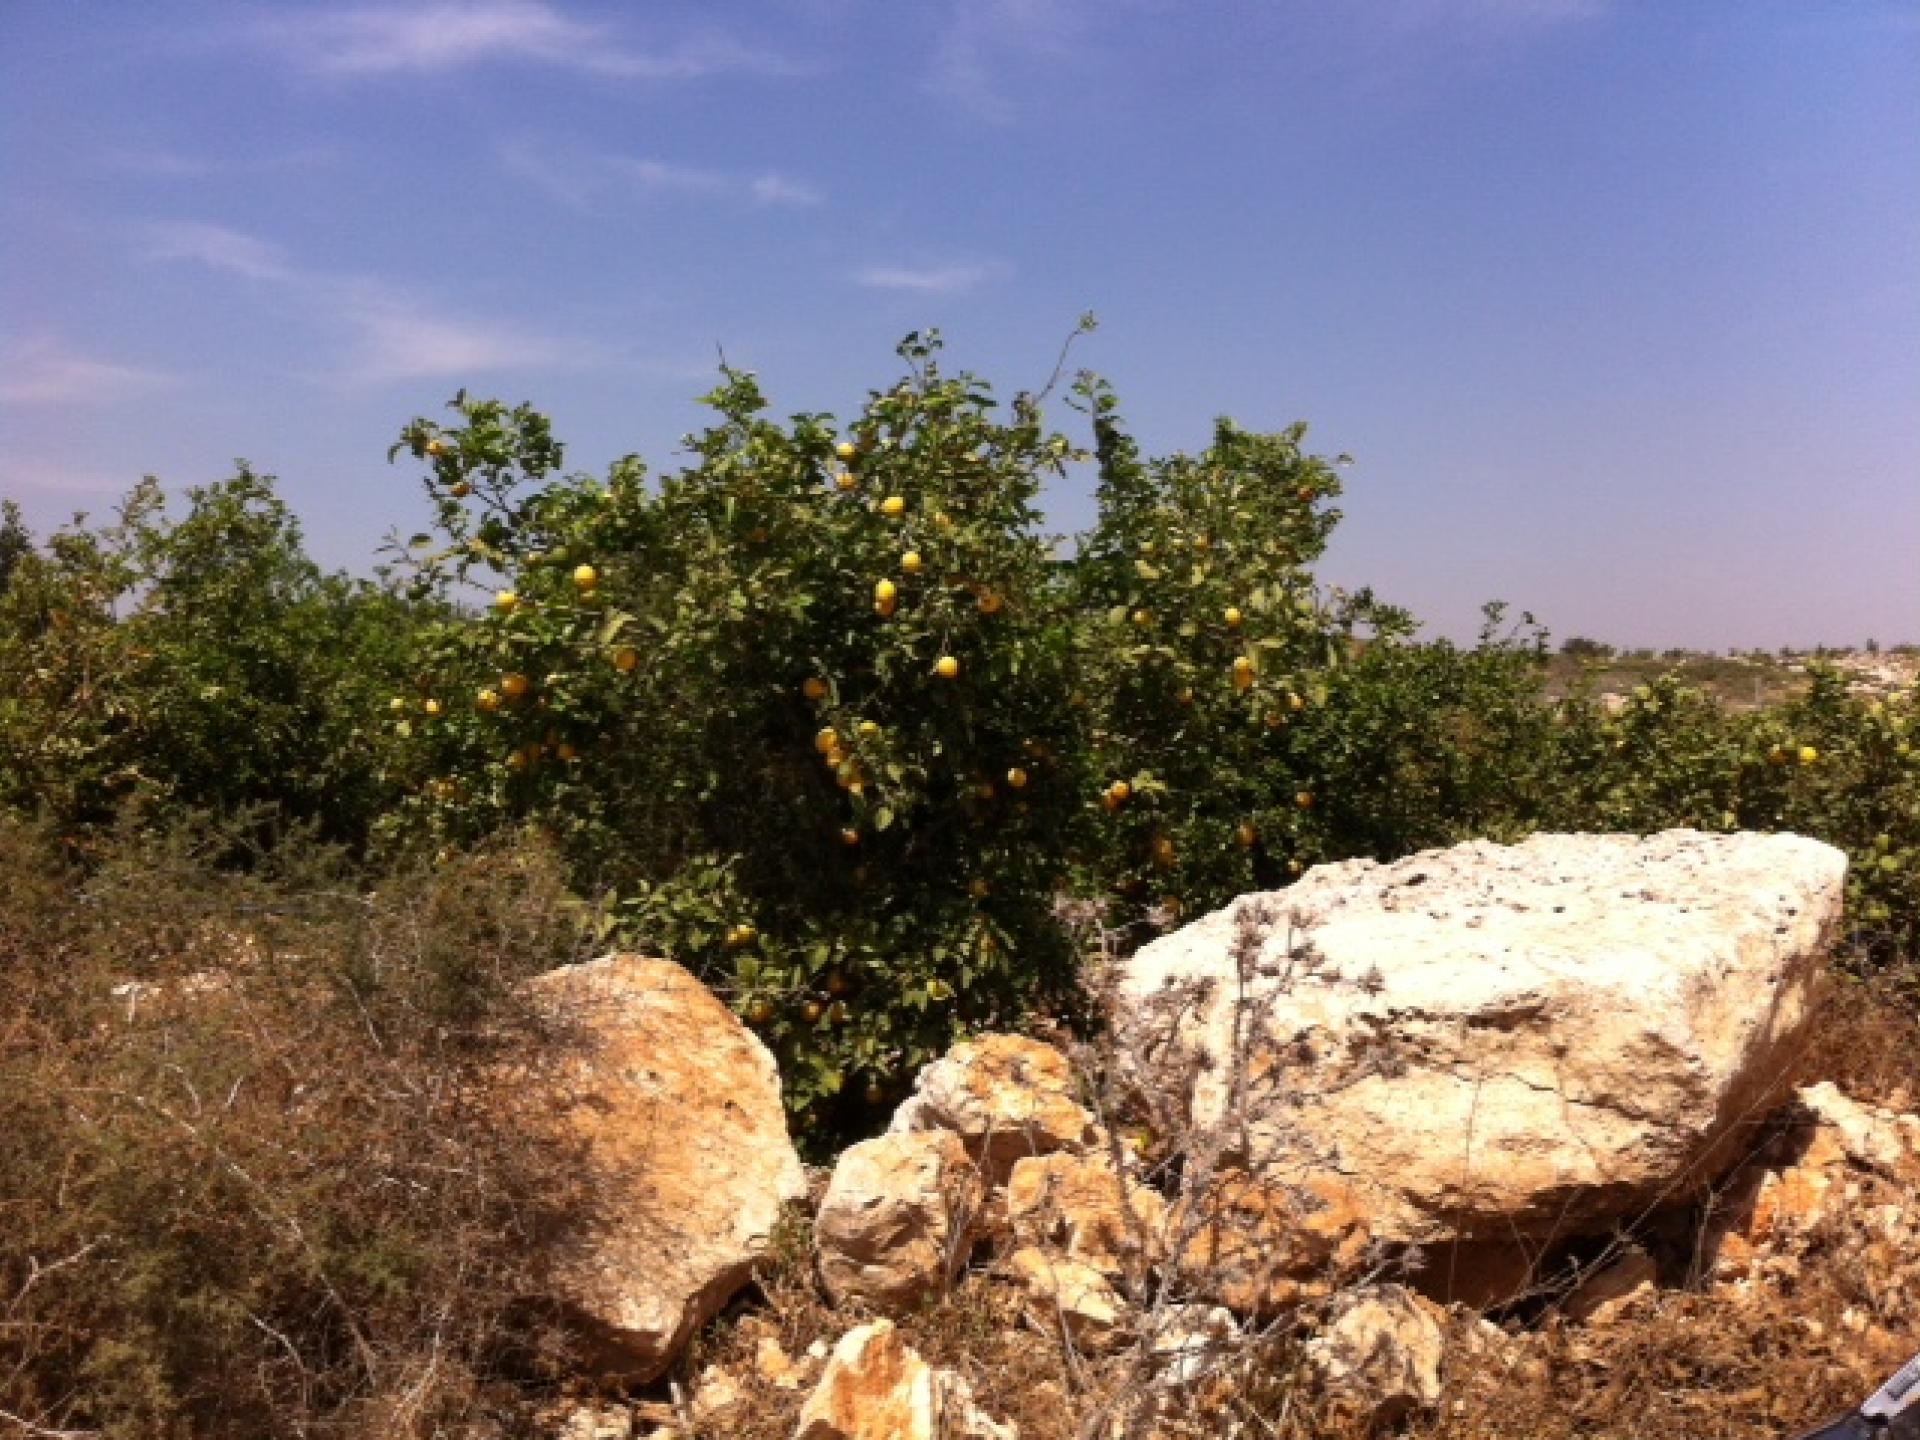 A lemon grove on the way to Falamiya South.